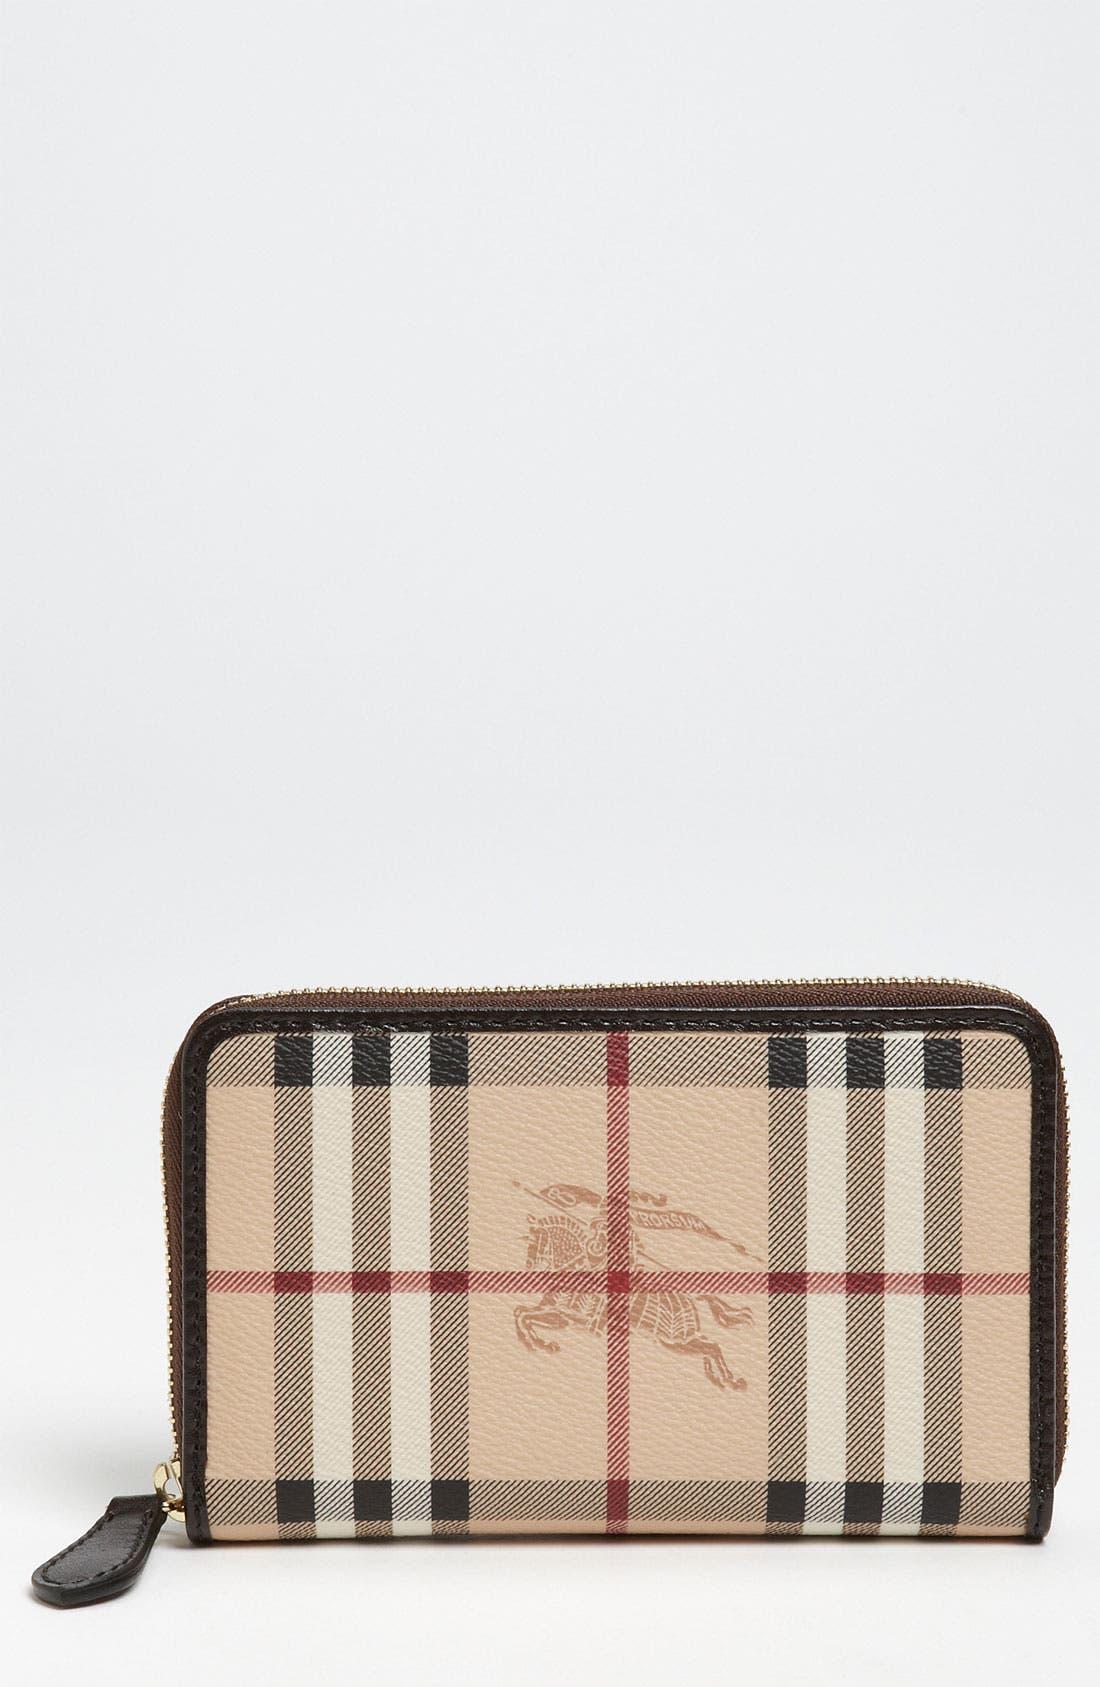 Alternate Image 1 Selected - Burberry 'Haymarket Check' Compact Zip Around Wallet